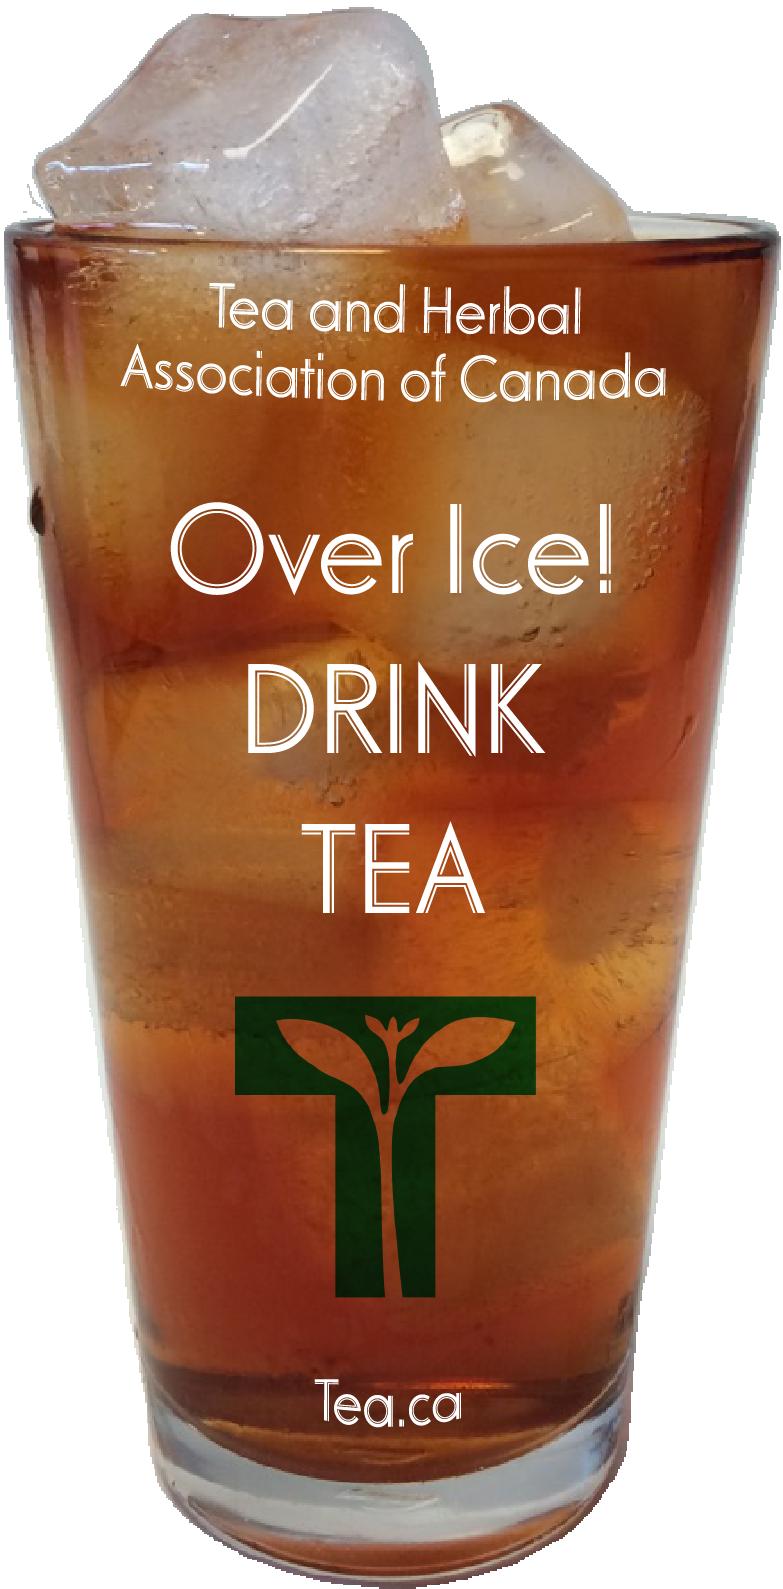 Over Ice! Drink Tea!